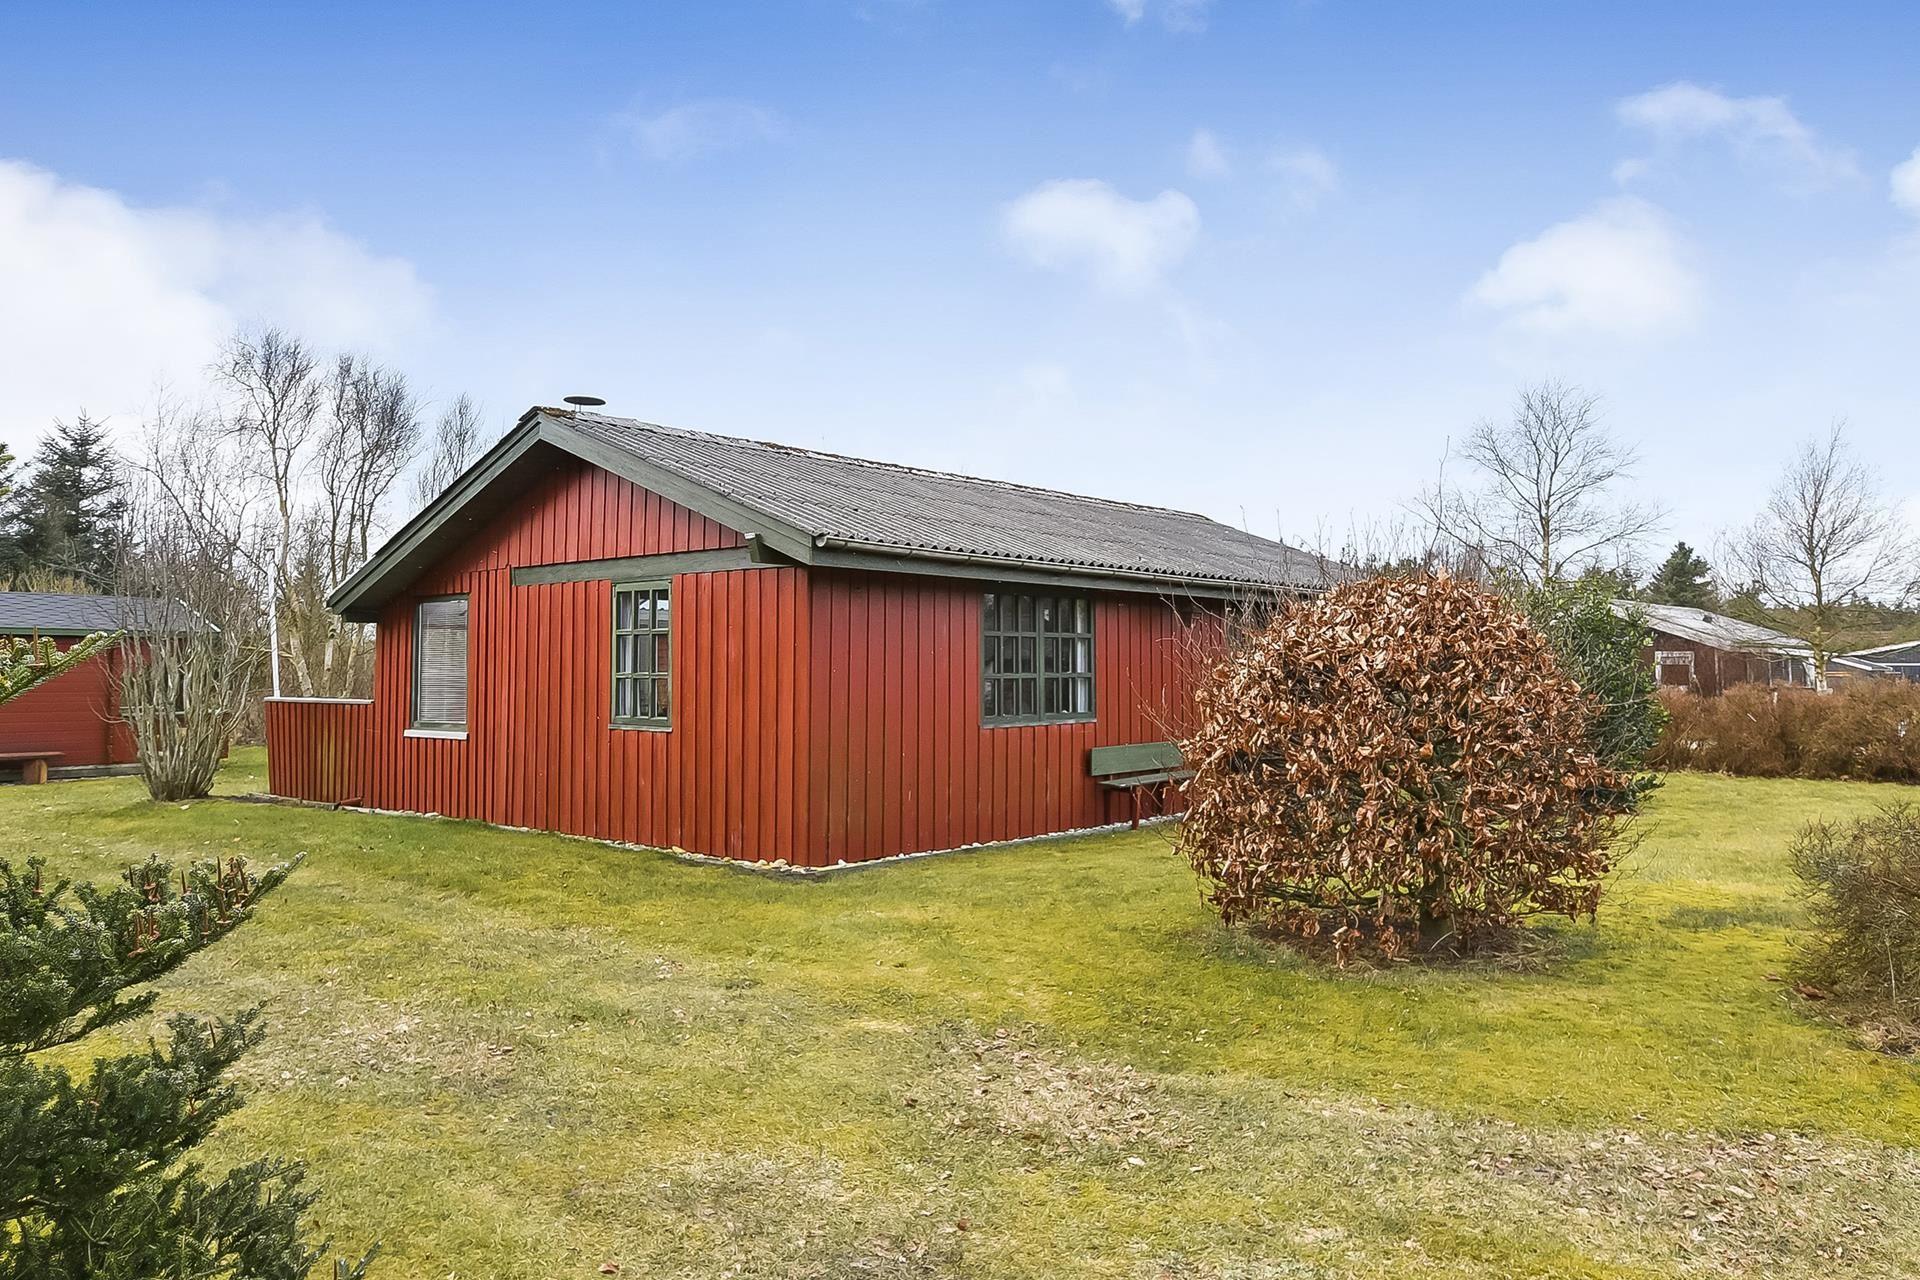 Røllikevej 229, 6990 Ulfborg